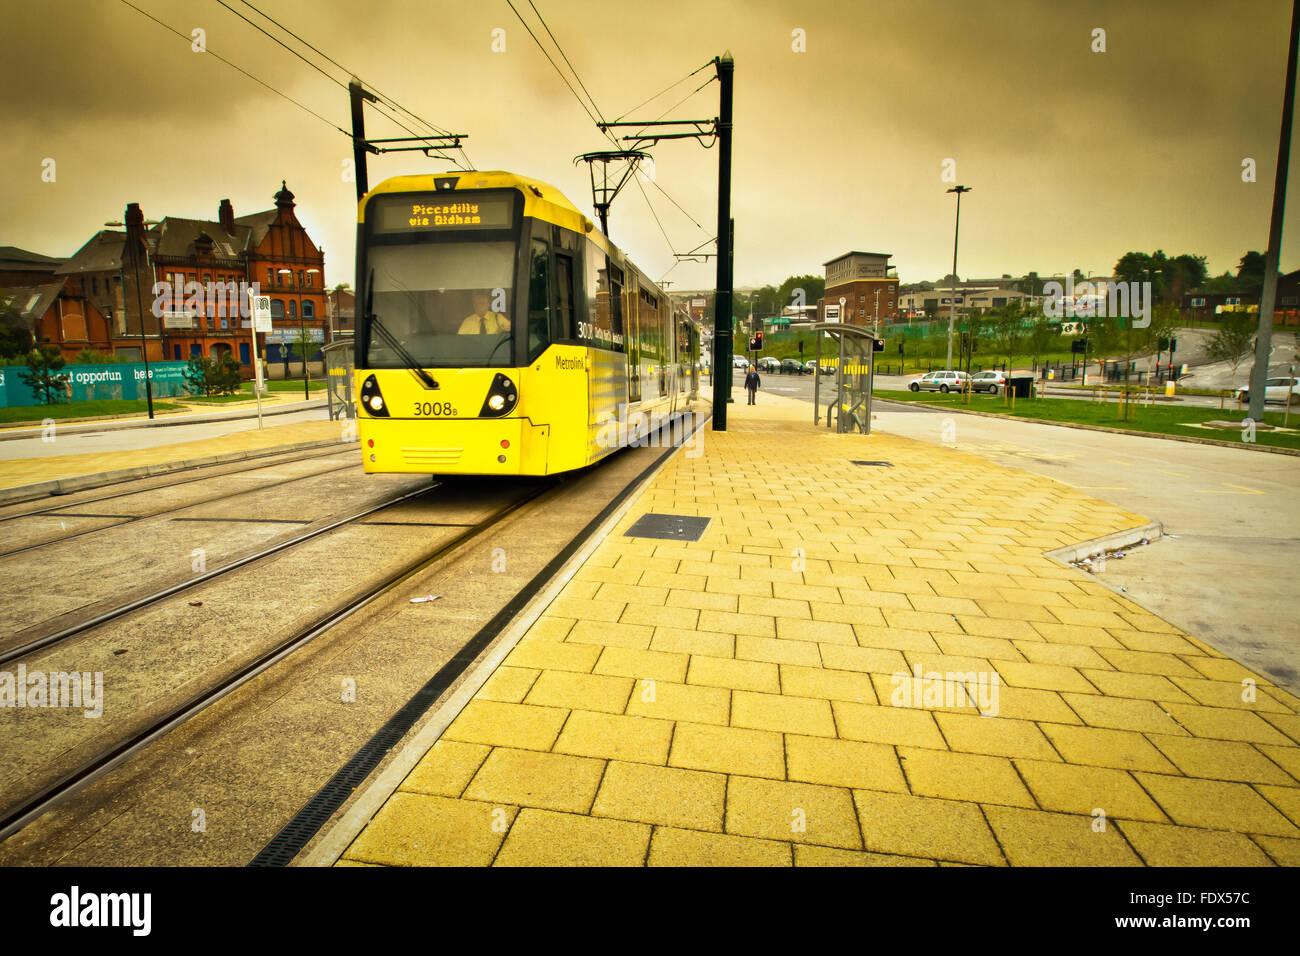 Tram arriving at Mumps Bridge, Oldham, Lancashire, UK - Stock Image